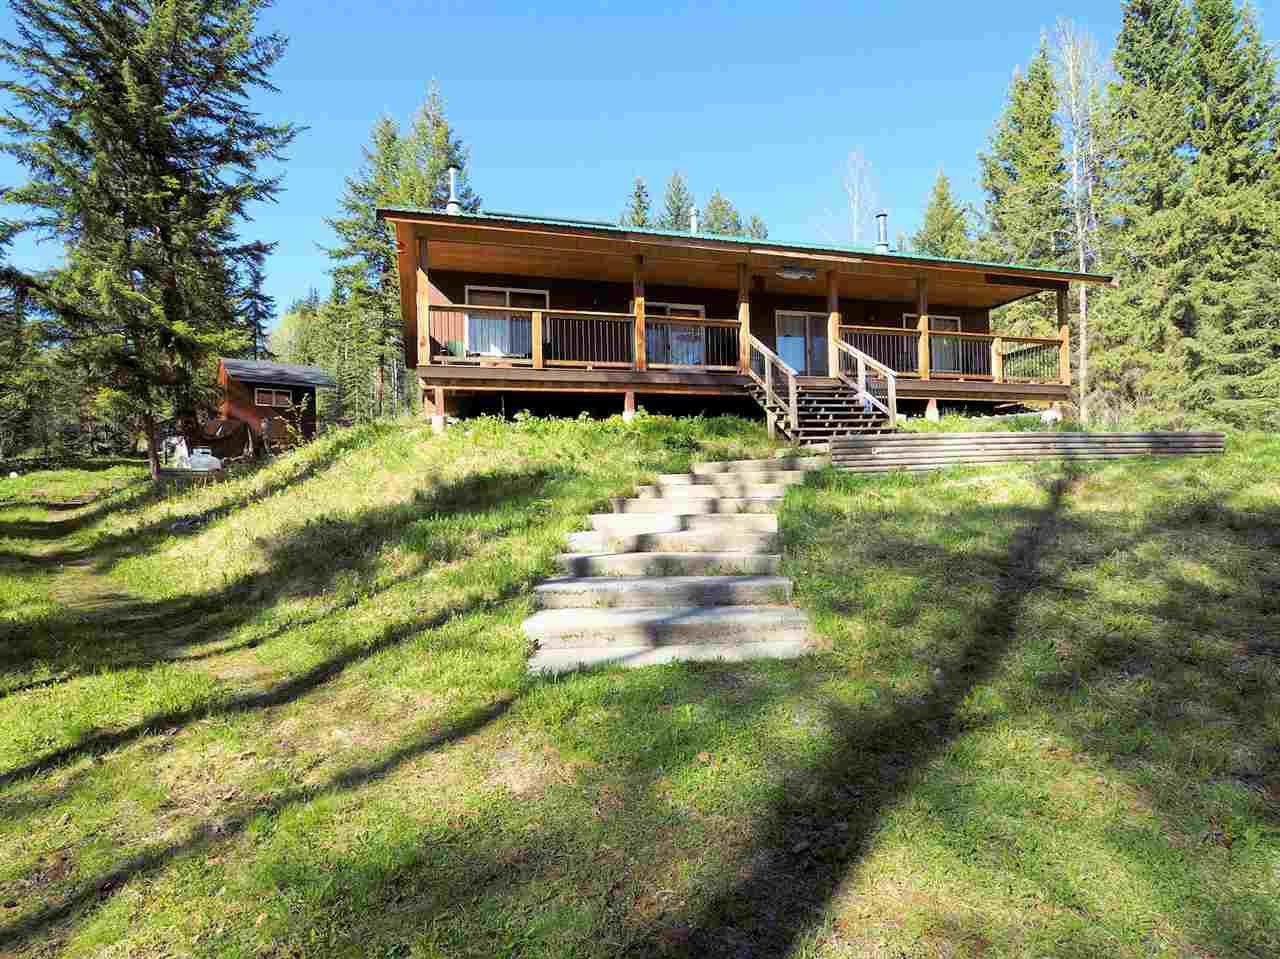 Photo 3: Photos: 8222 CENTENNIAL Road in Bridge Lake: Bridge Lake/Sheridan Lake House for sale (100 Mile House (Zone 10))  : MLS®# R2457362